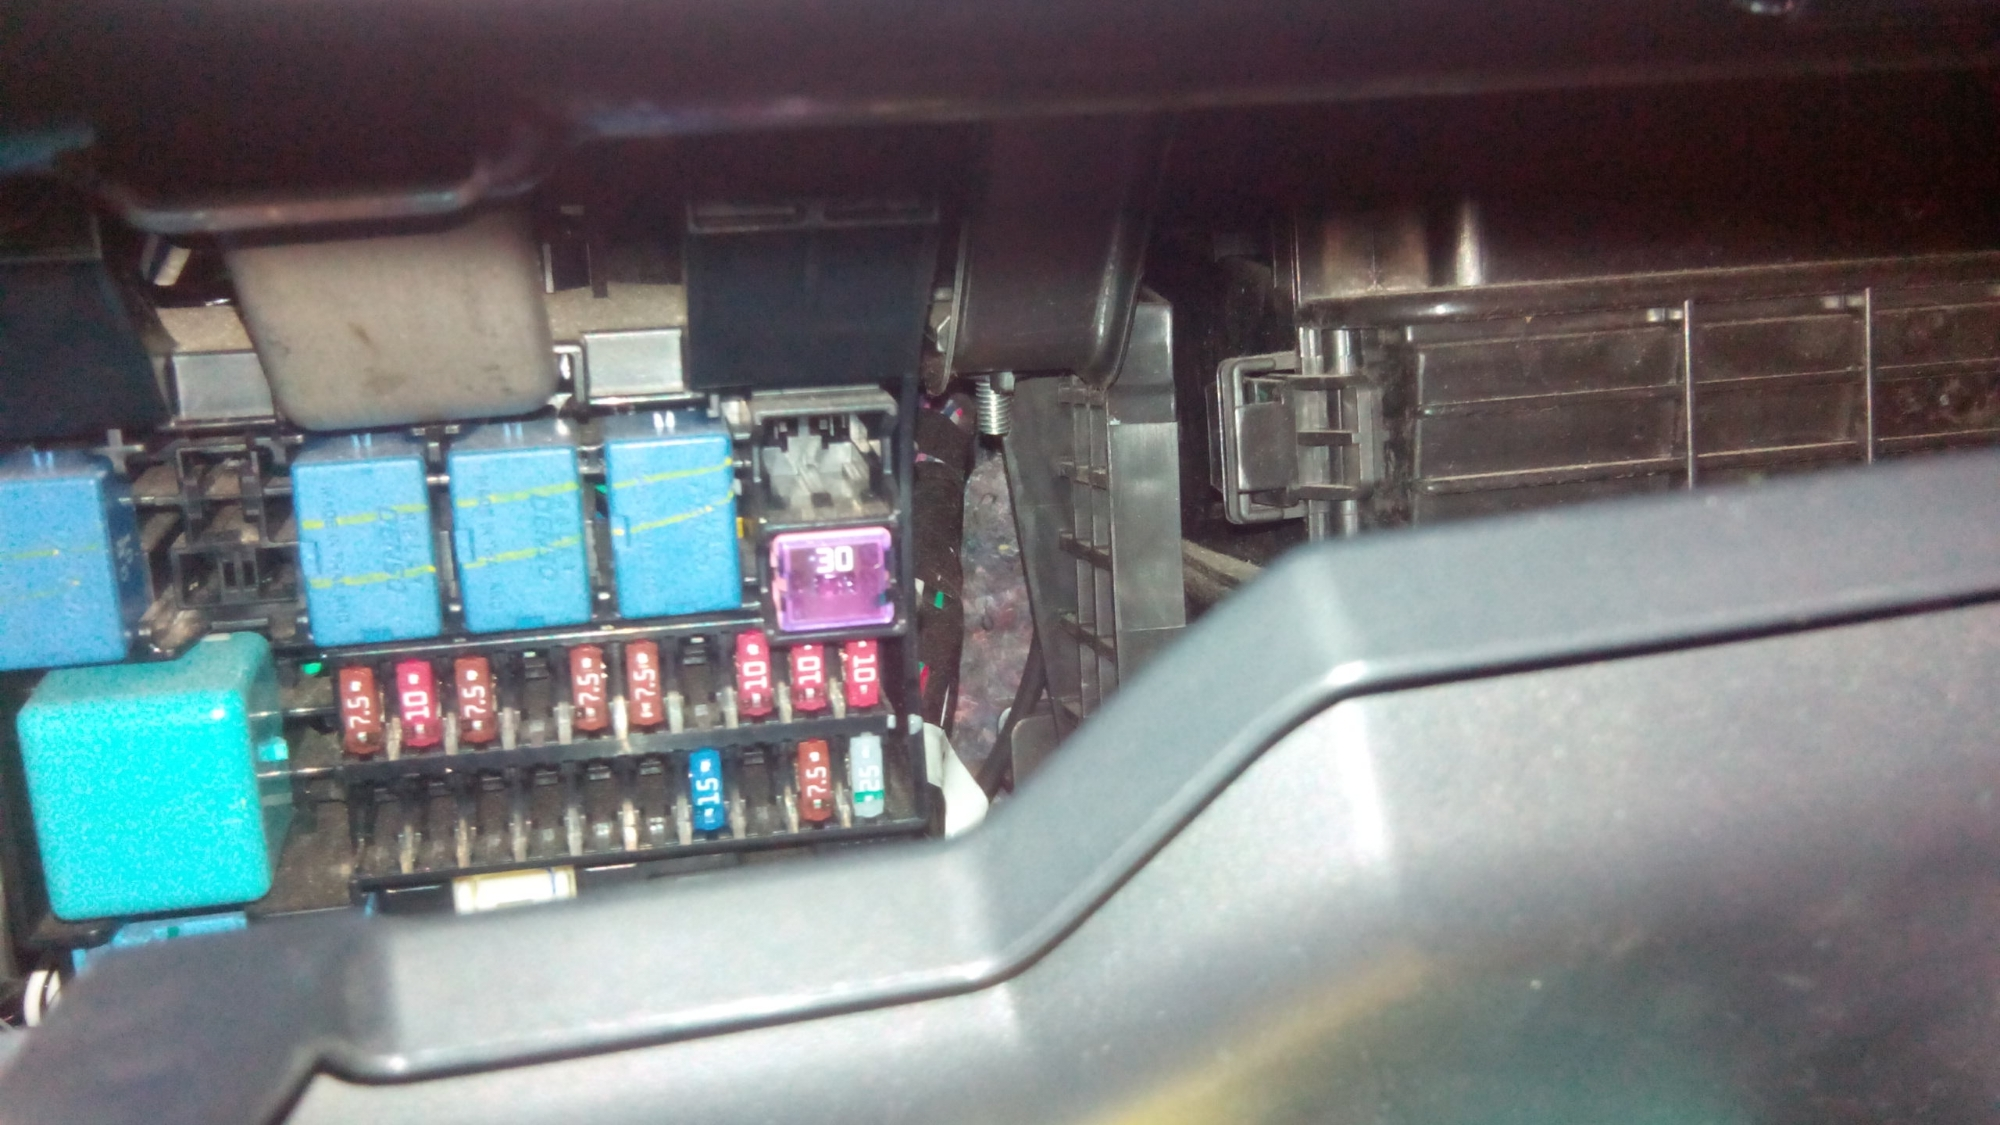 hight resolution of fuse box daihatsu taruna wiring diagrams 101 wrg 9367 daihatsu fourtrak fuse box location